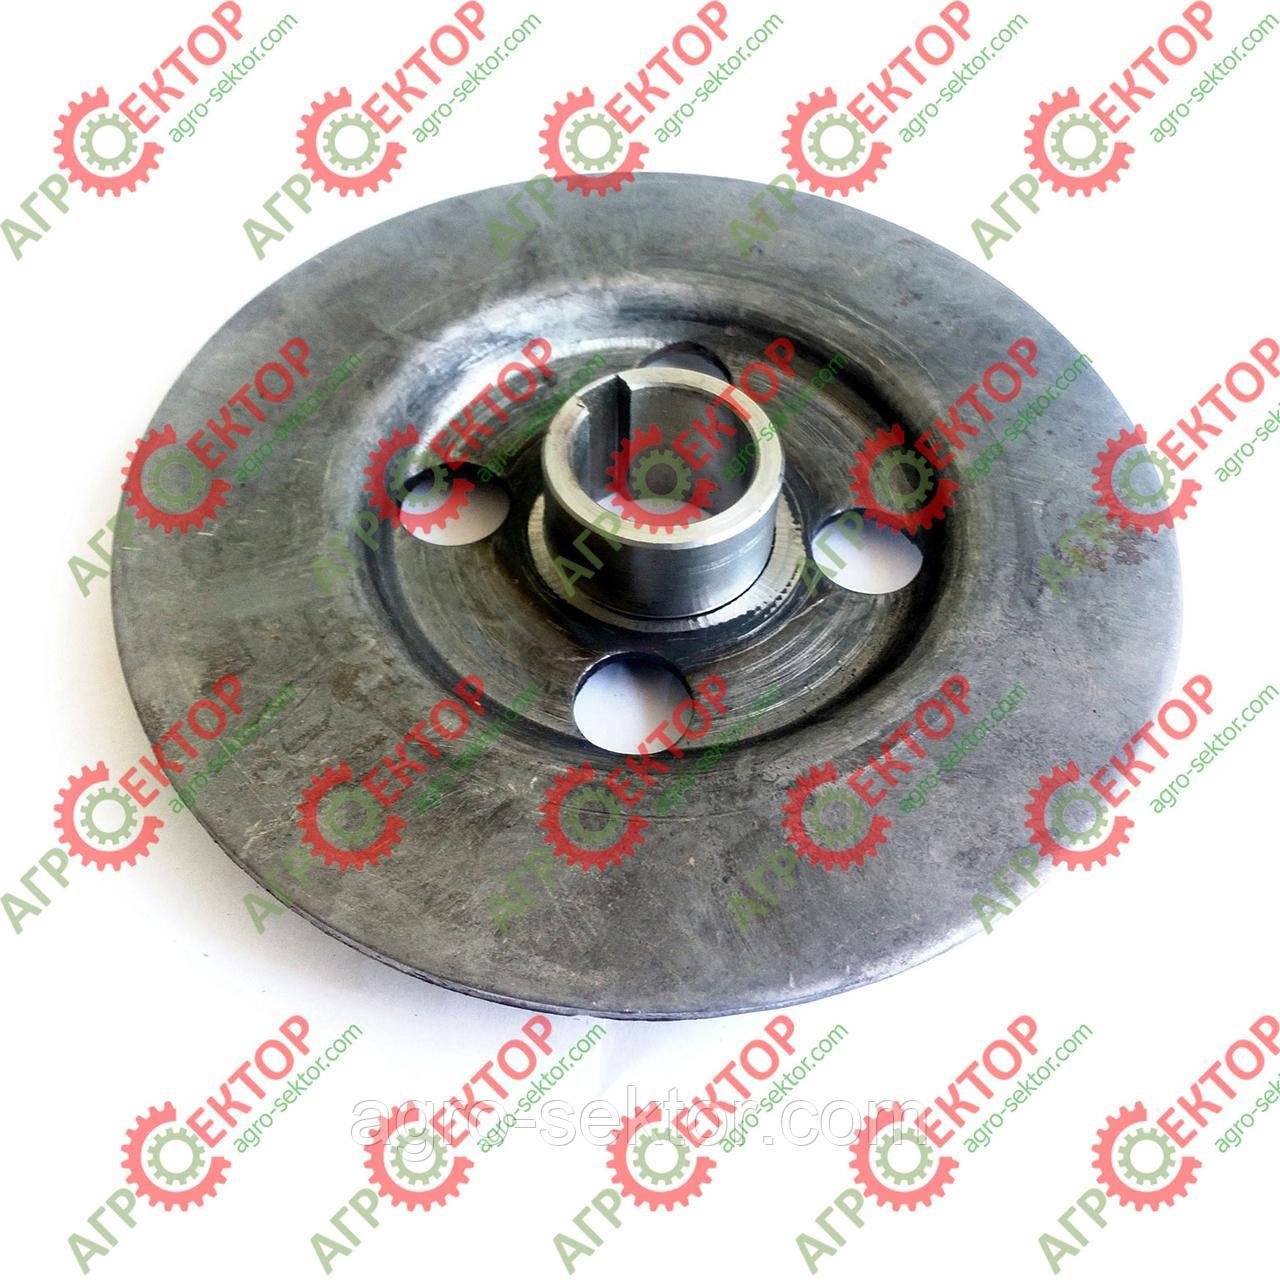 Тормозной диск вала стола в'язального на прес-підбирач Sipma Z-224 2023-070-540.01